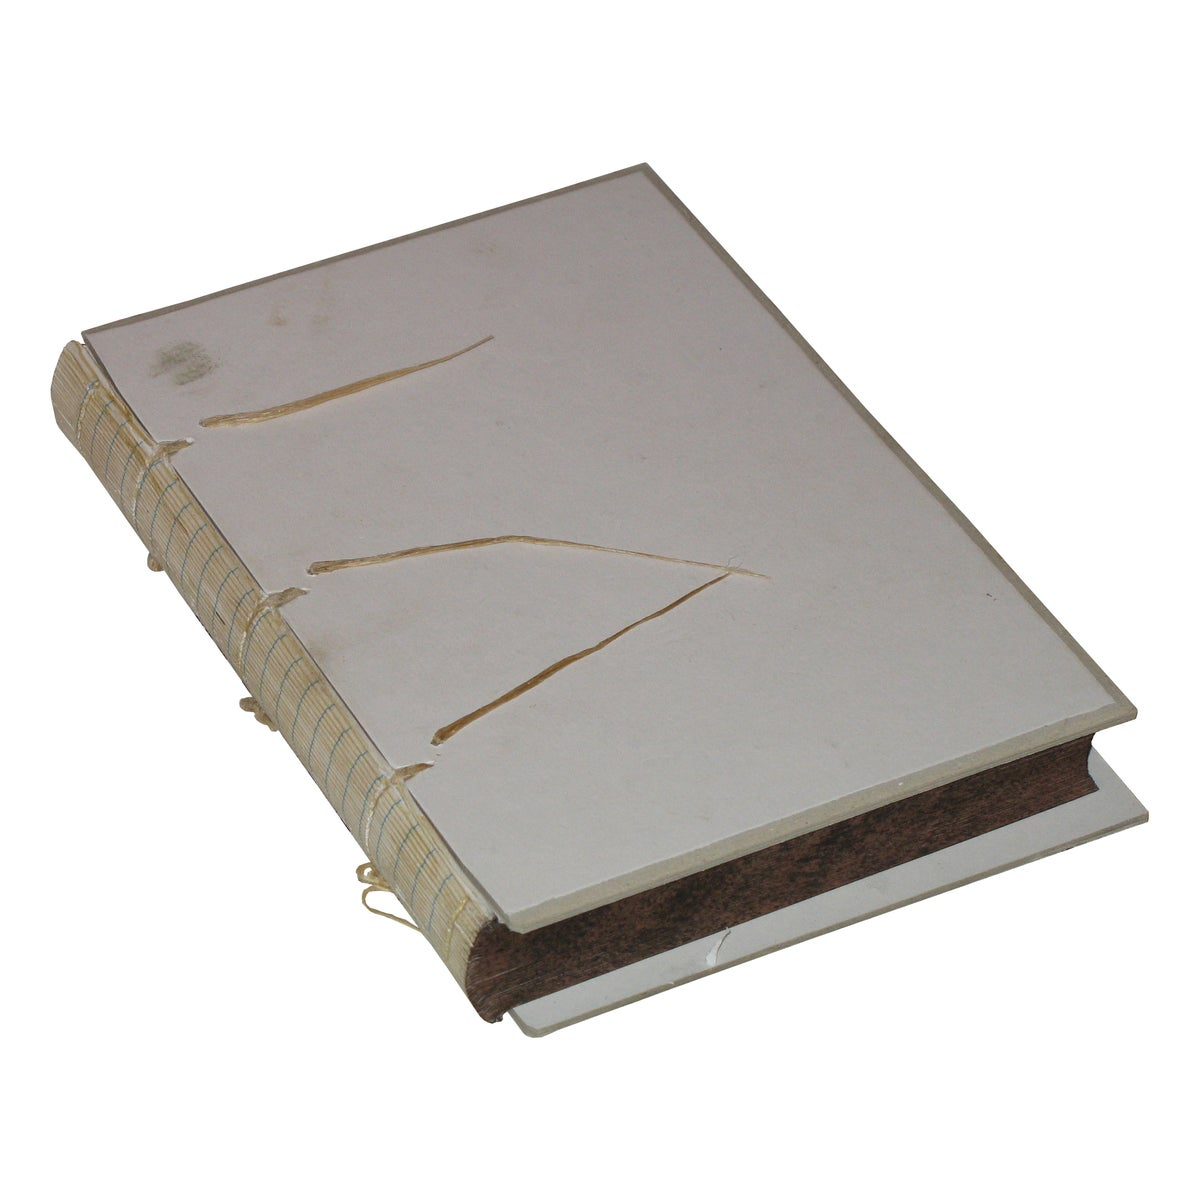 Image of Level 4: Letterpress binding